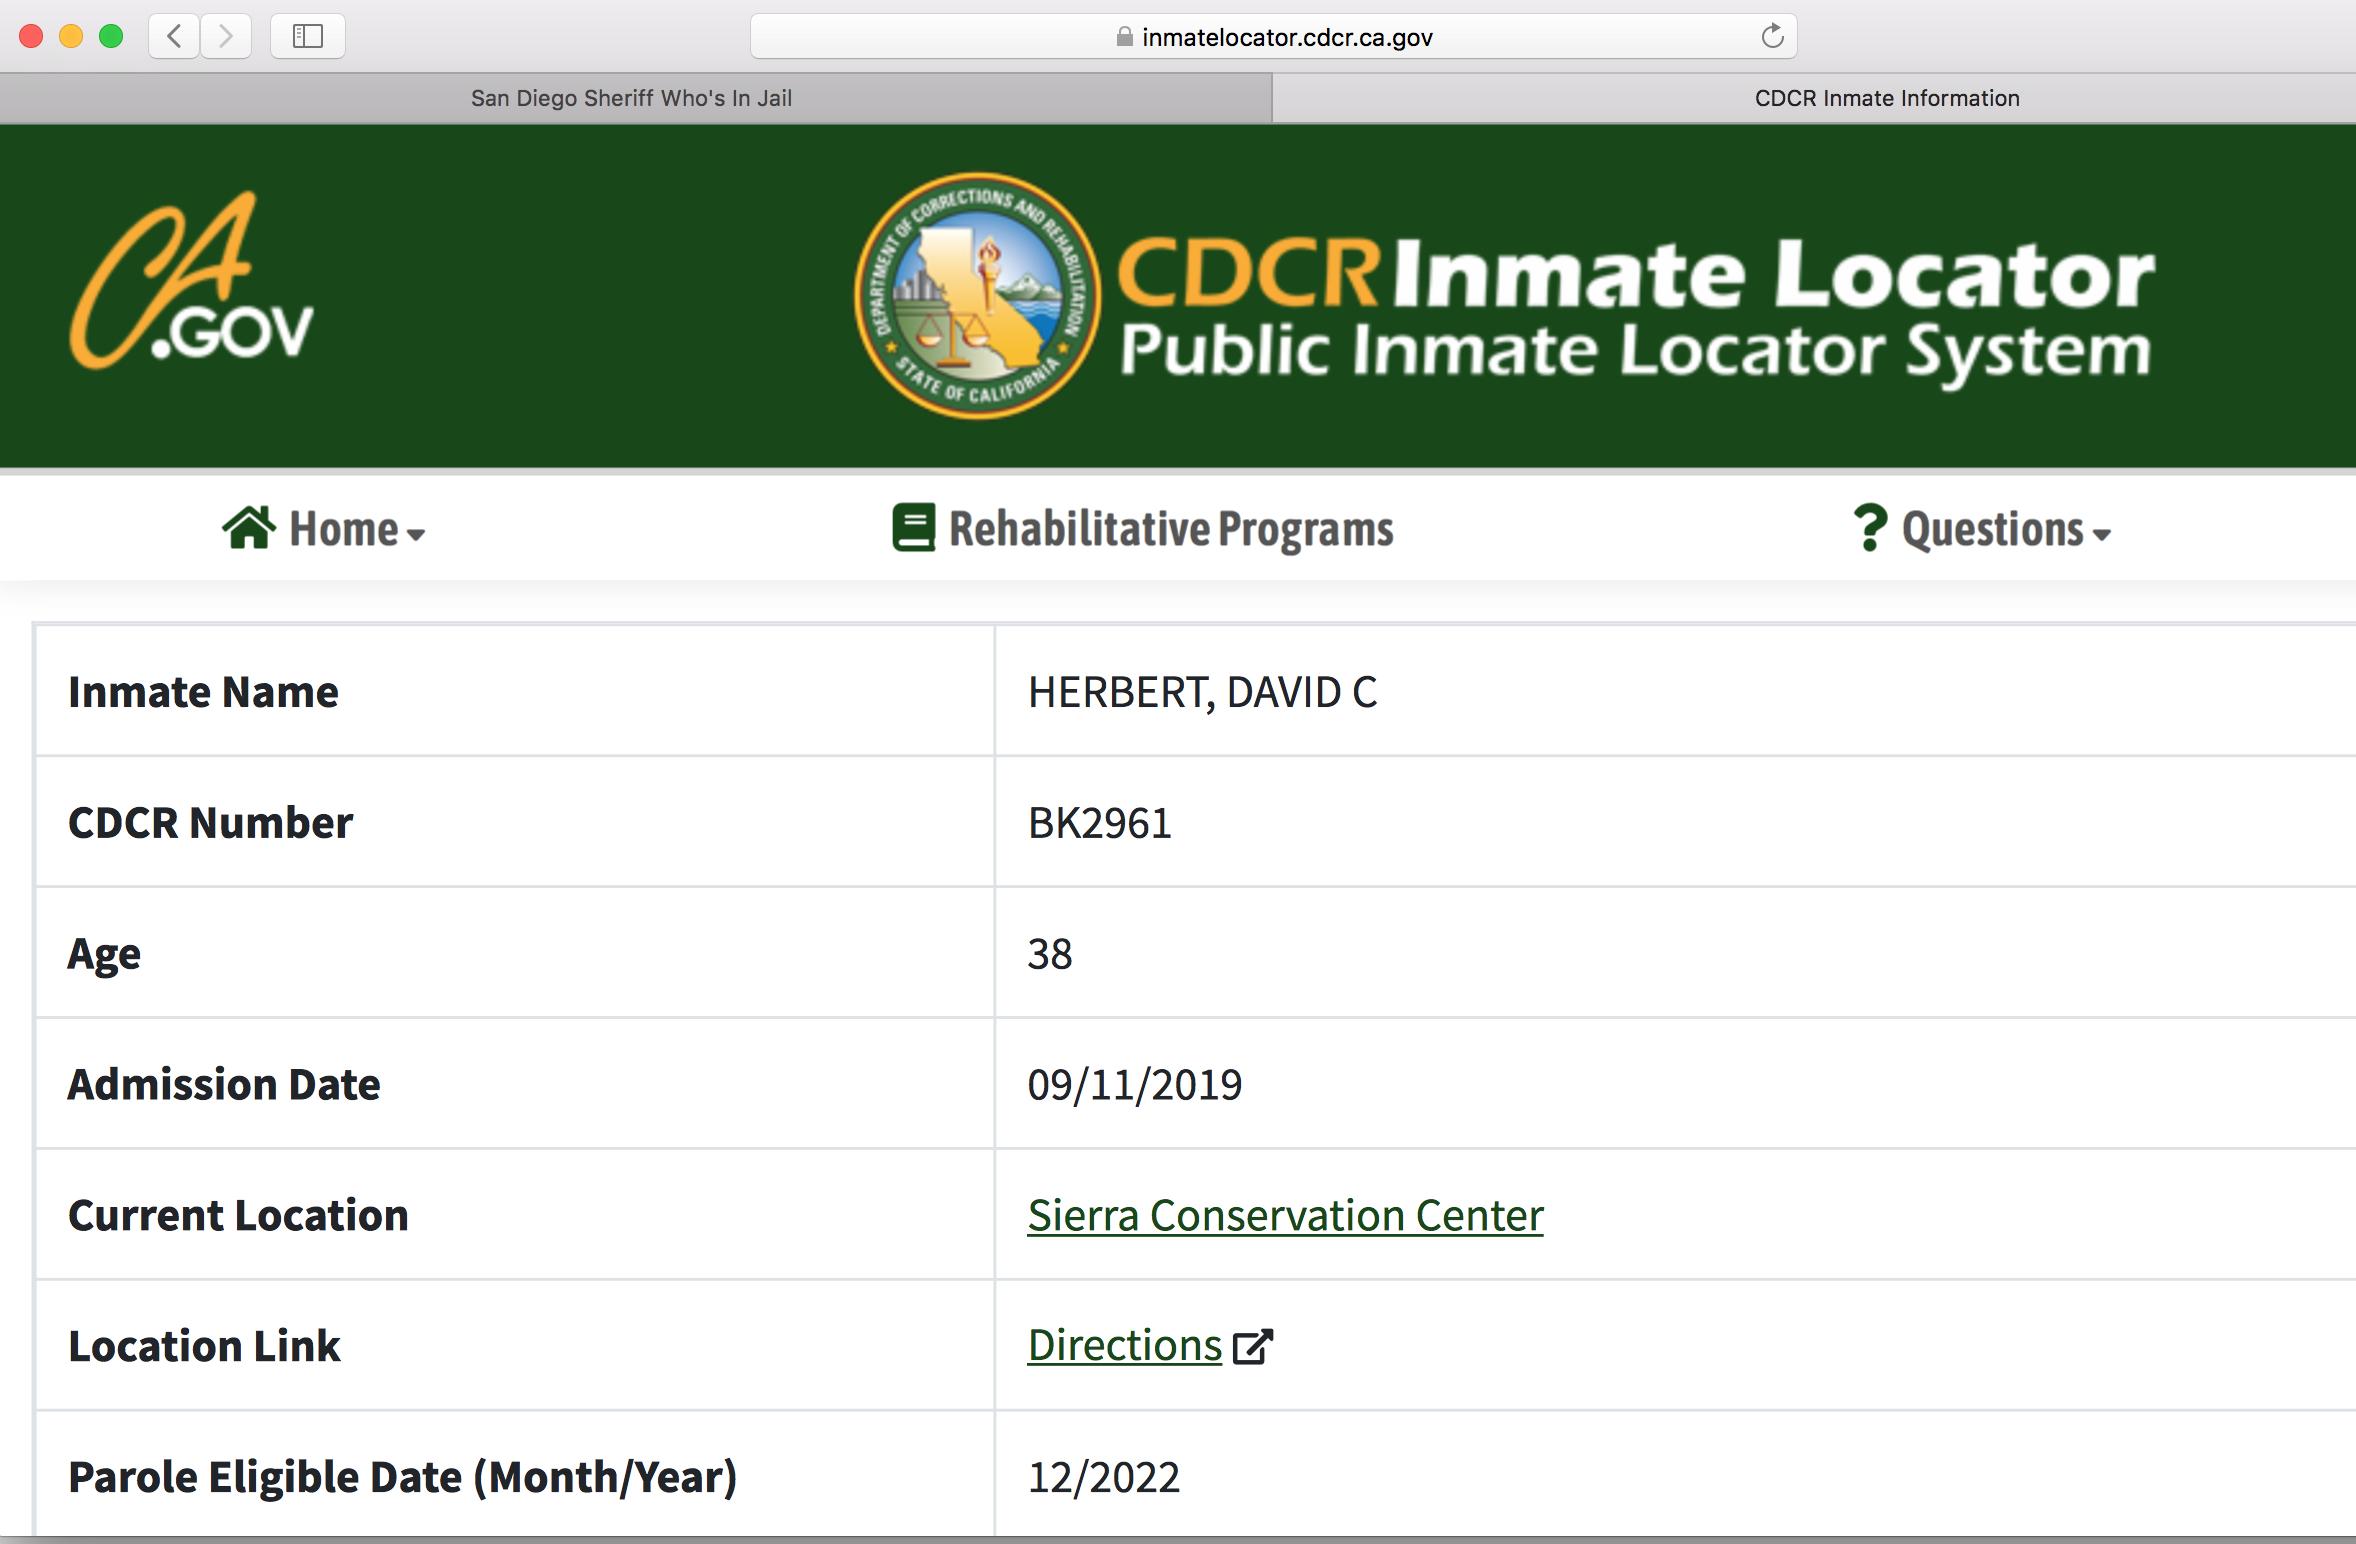 Herbert might get paroled in 3 years.